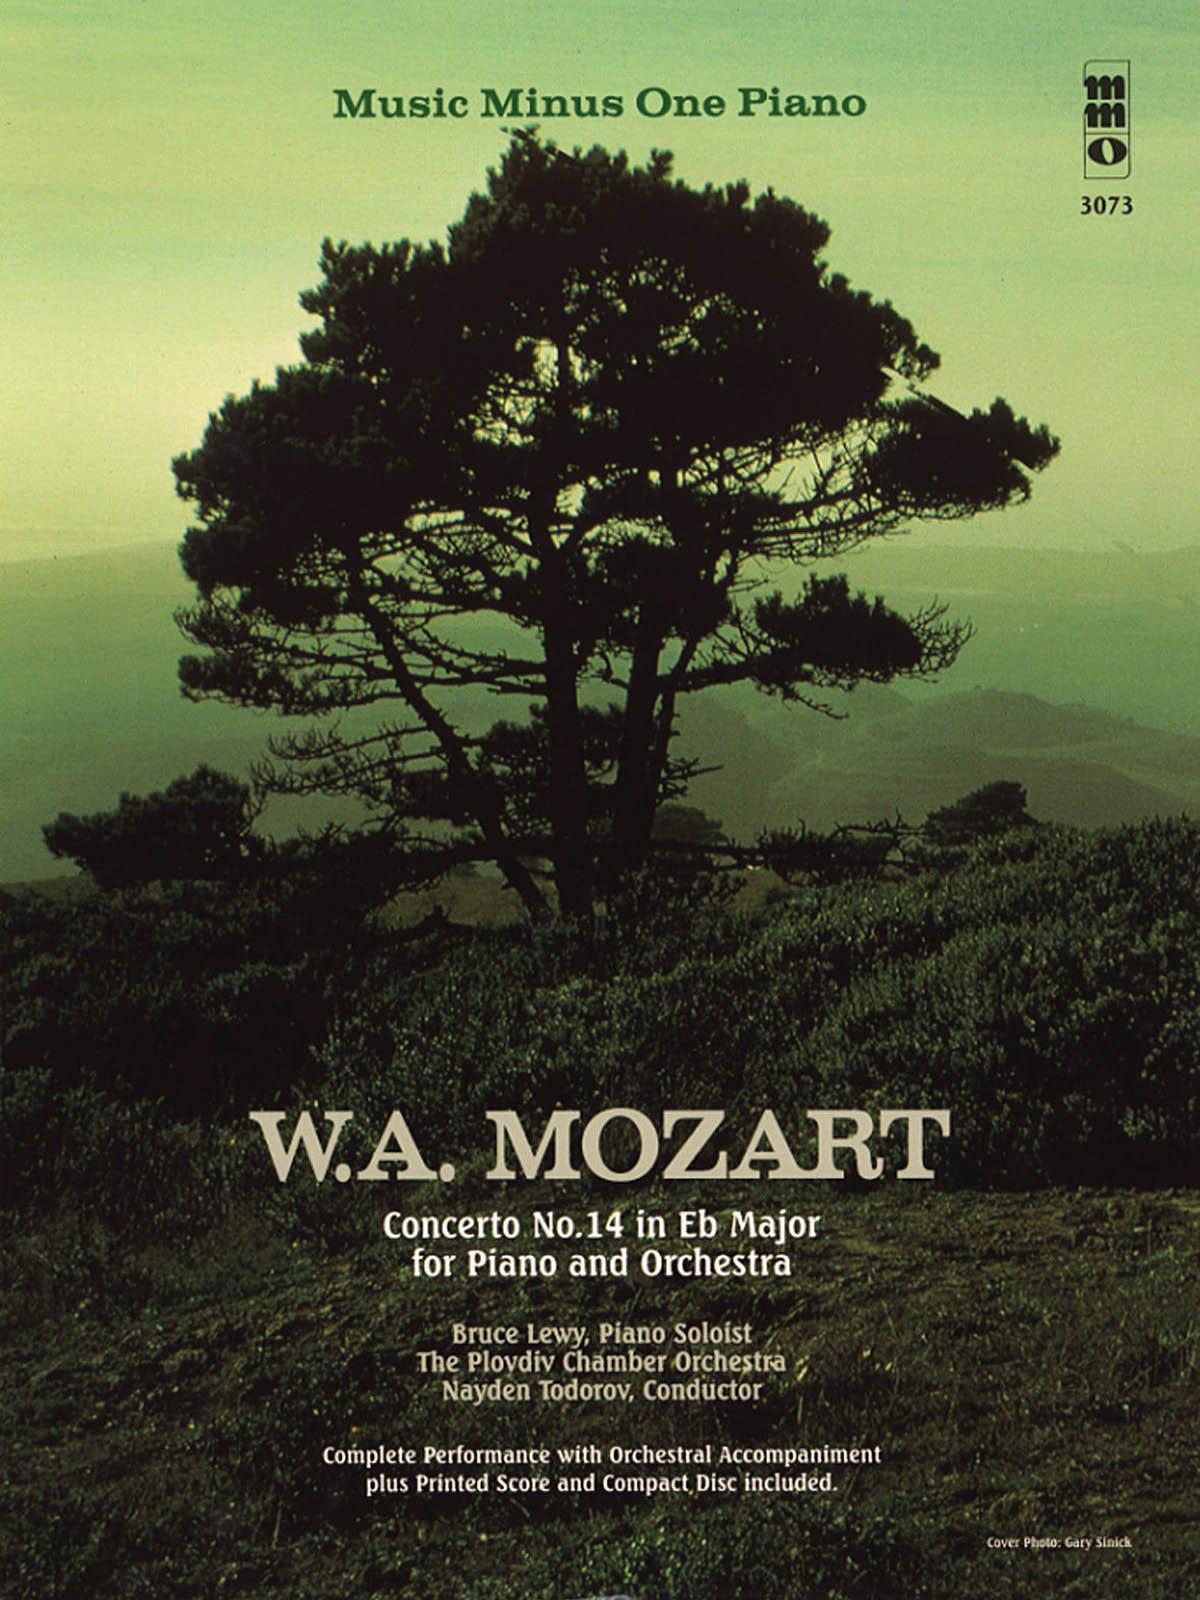 Wolfgang Amadeus Mozart: Mozart - Concerto No. 14 in E-flat Major: Piano: